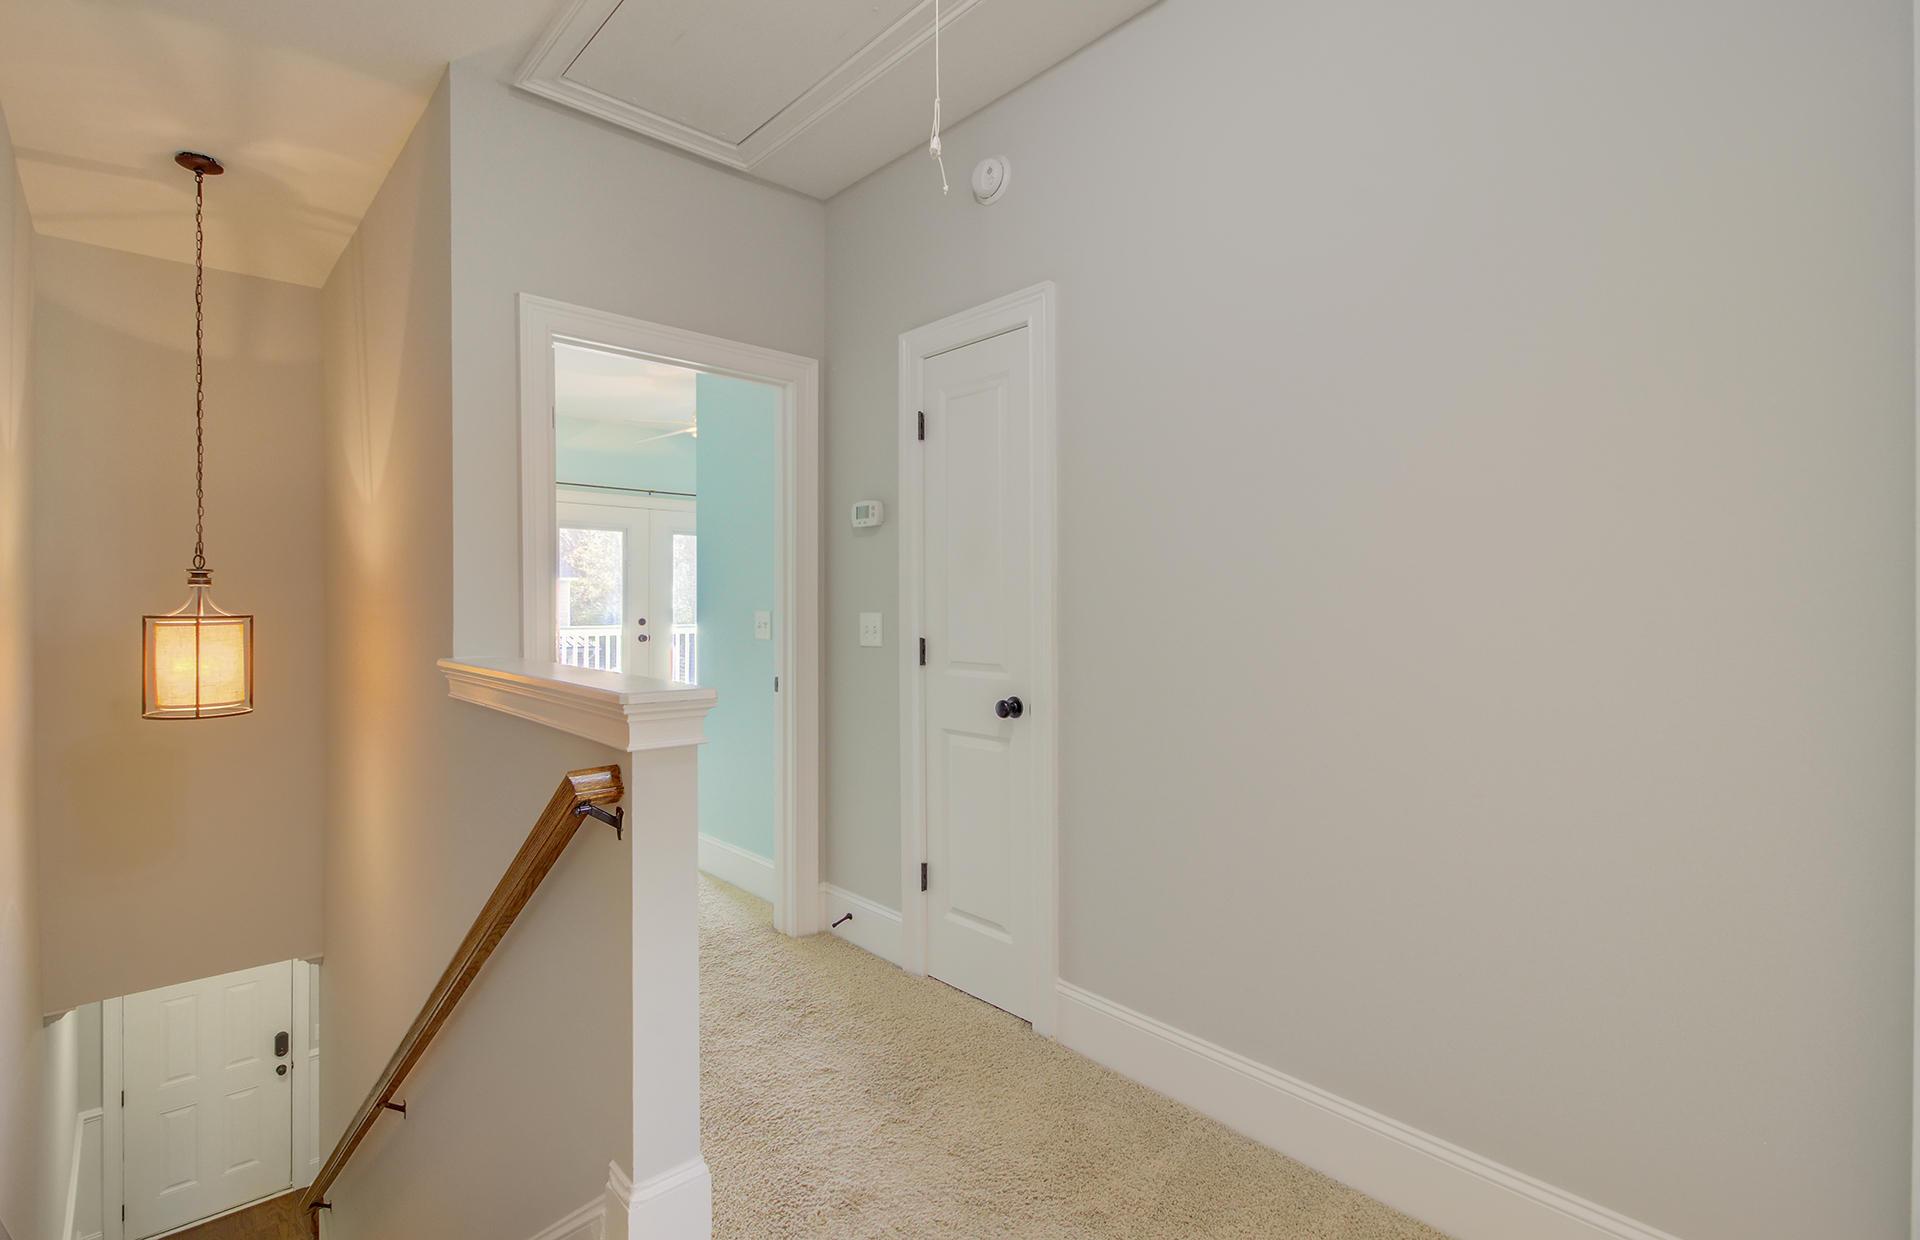 Carol Oaks Town Homes Homes For Sale - 2960 Emma, Mount Pleasant, SC - 11